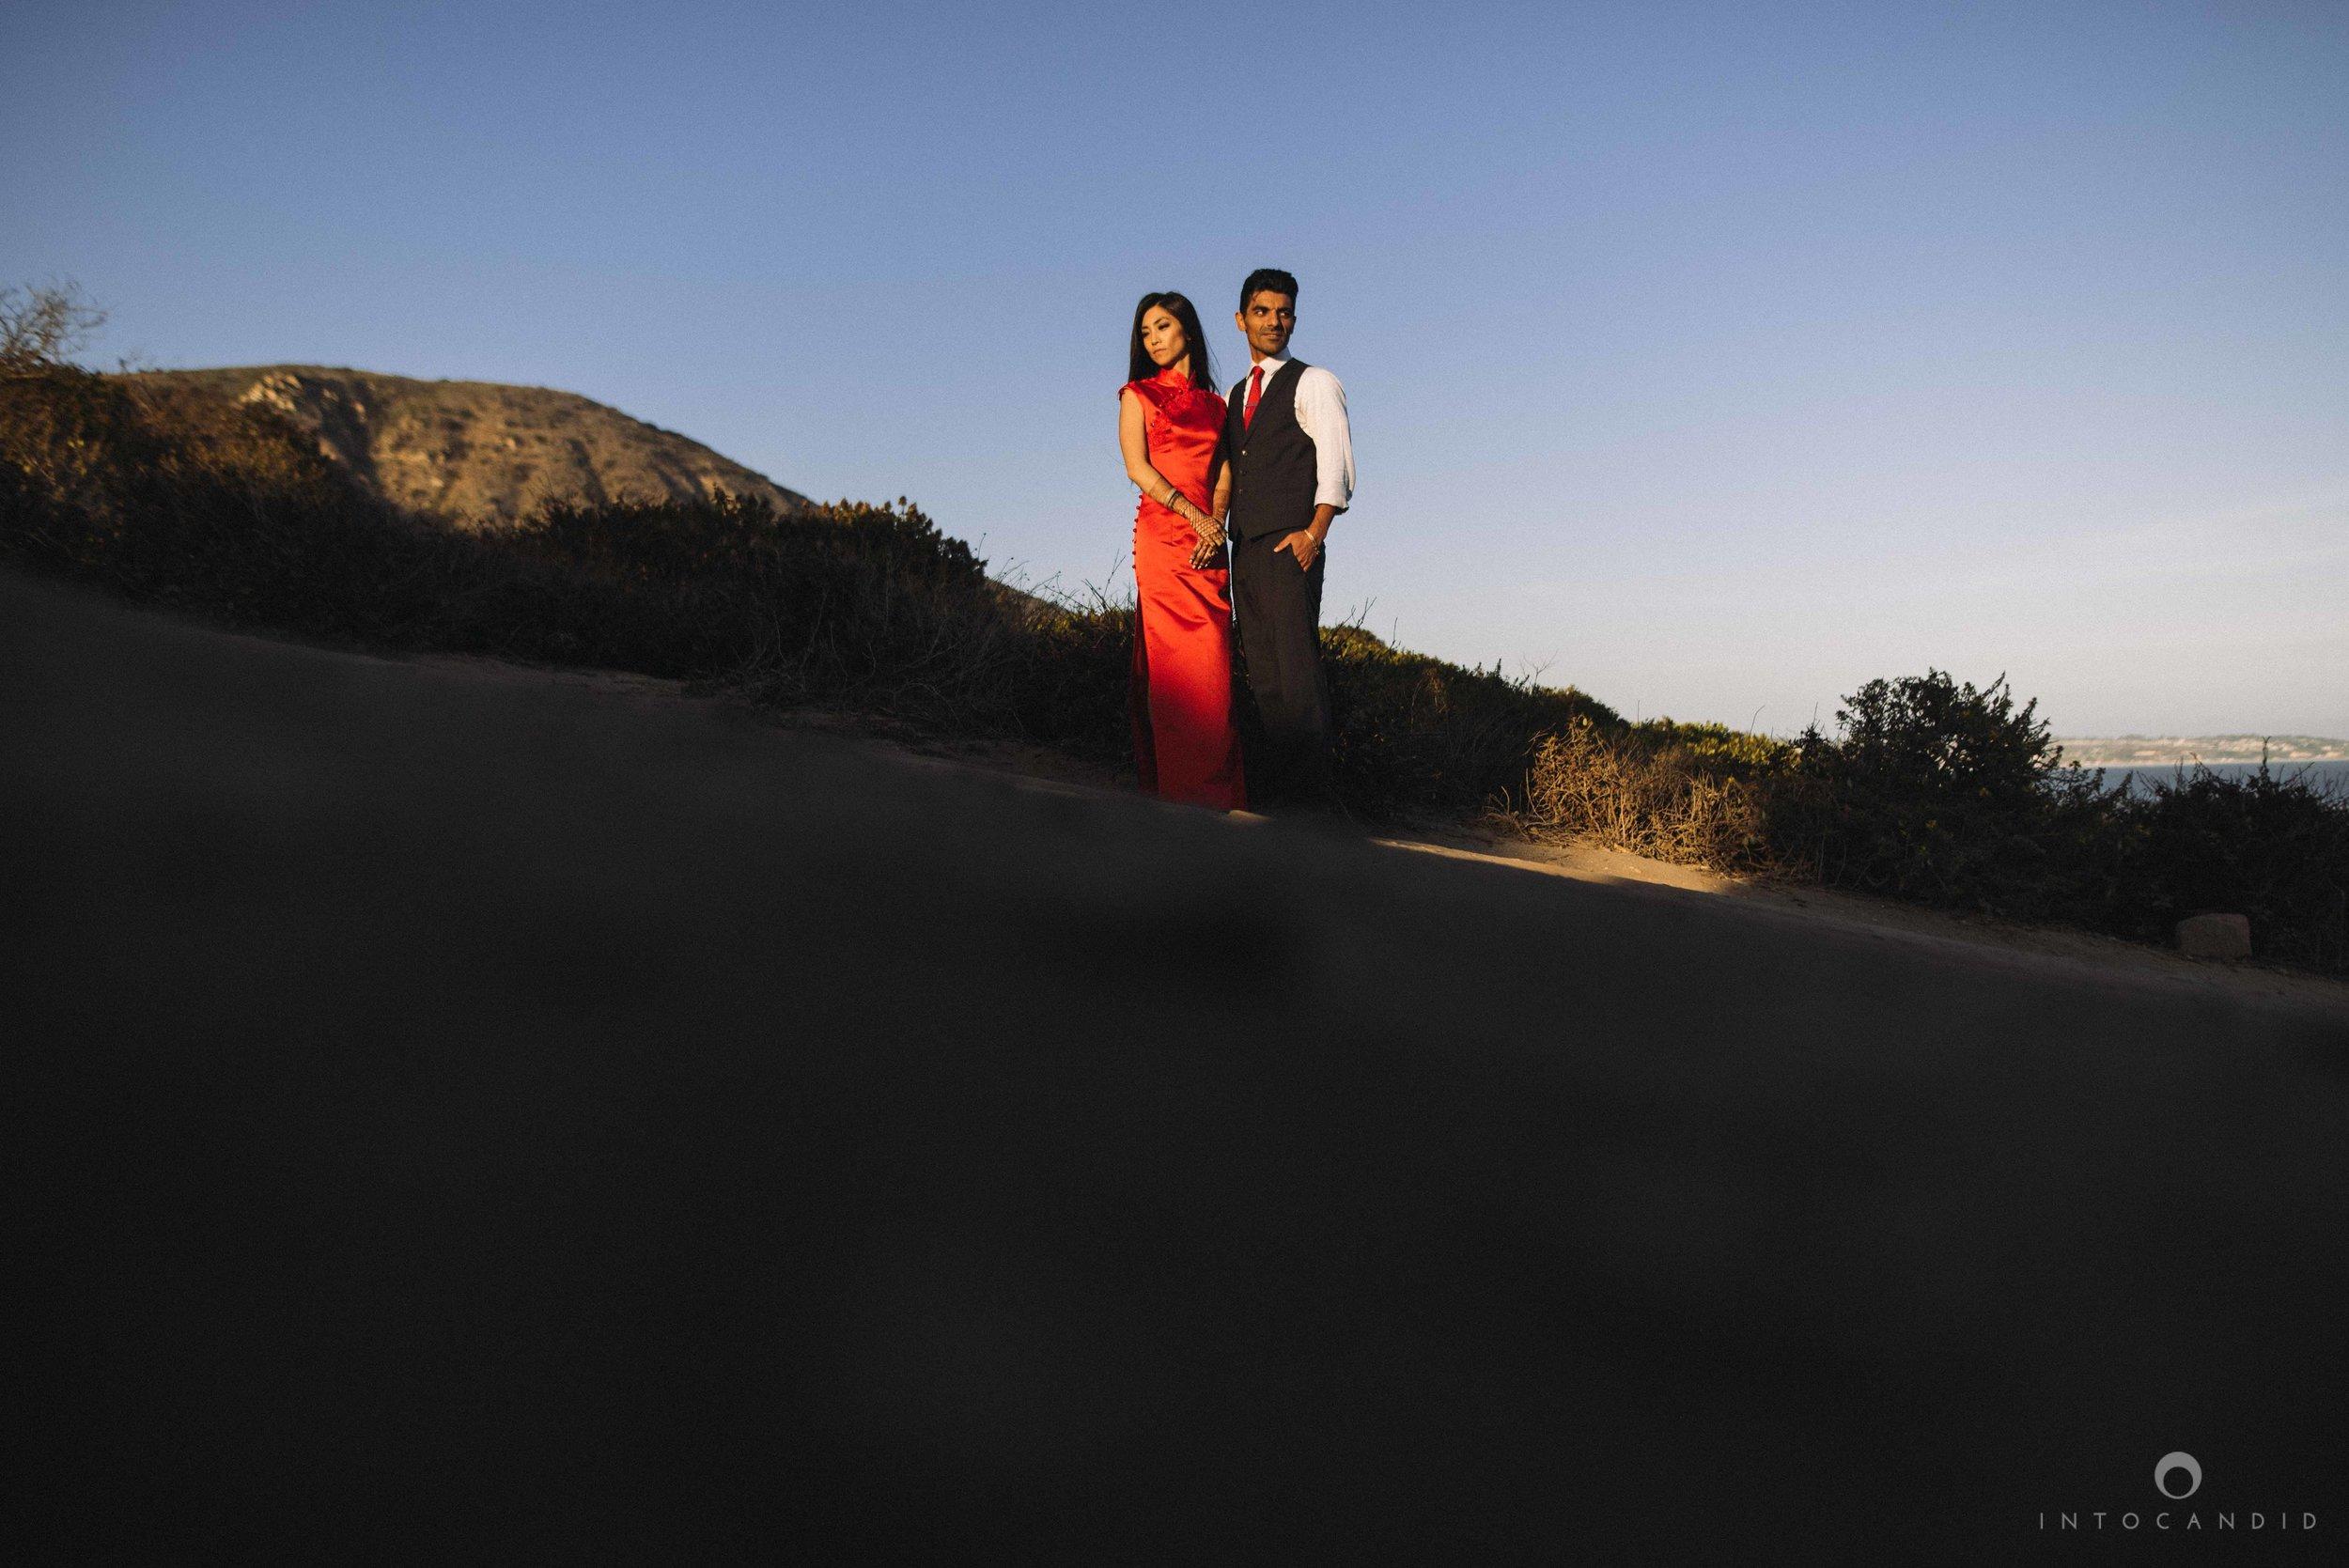 Malibu_California_Engagement_Photographer_AS_01.JPG